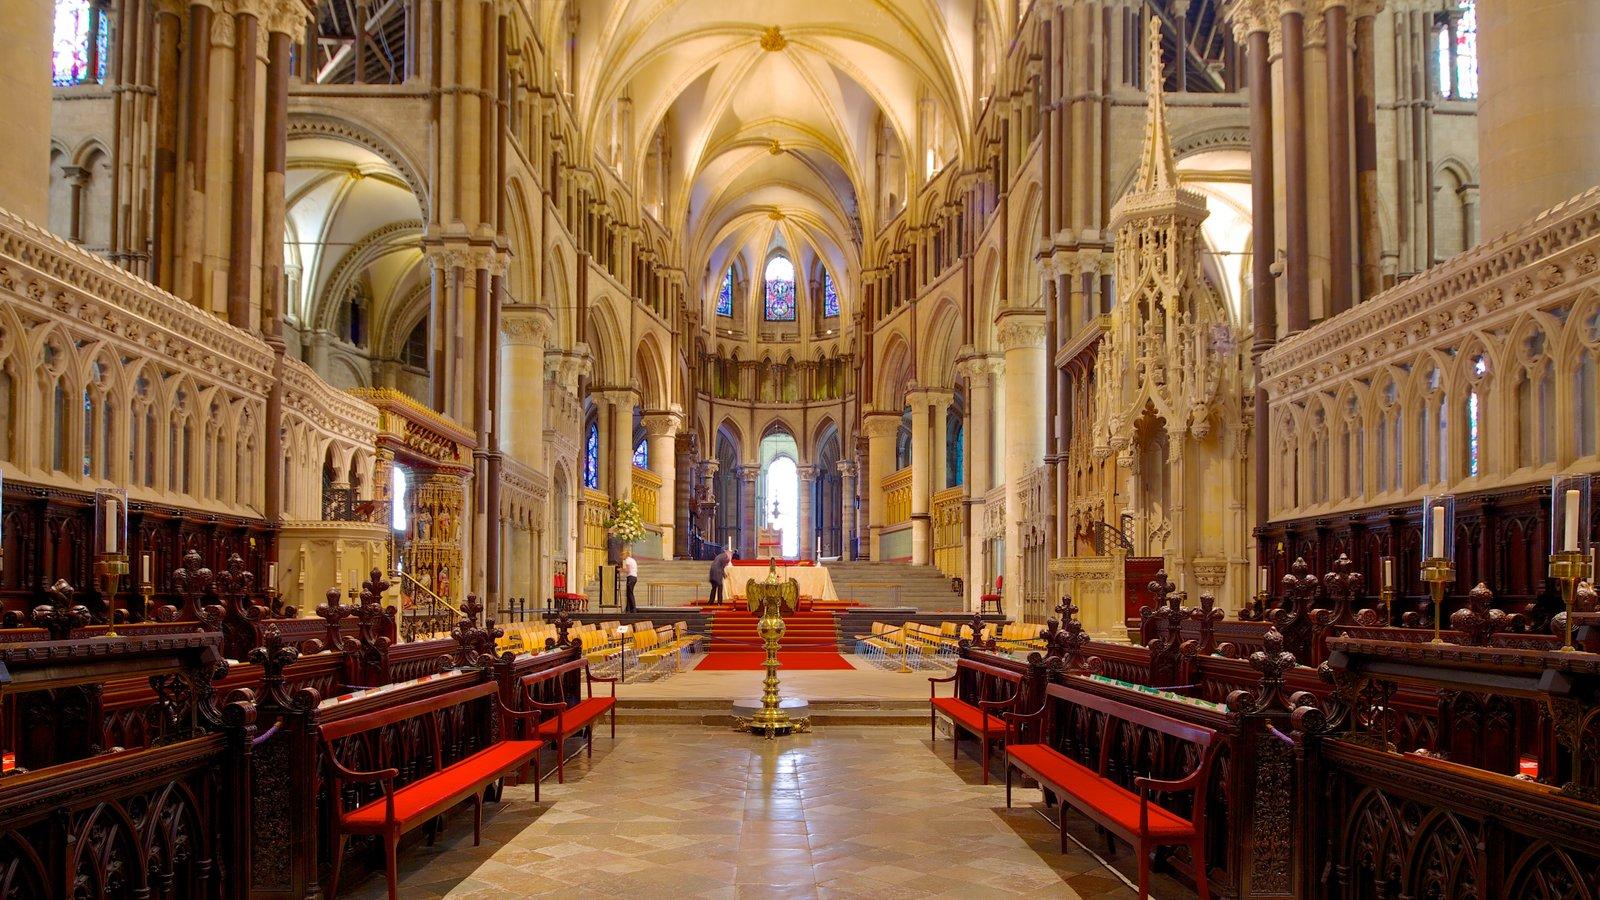 Le Symbolisme Chrétien - 19 eme siècle - Angleterre ( Images) 55714-Canterbury-Cathedral